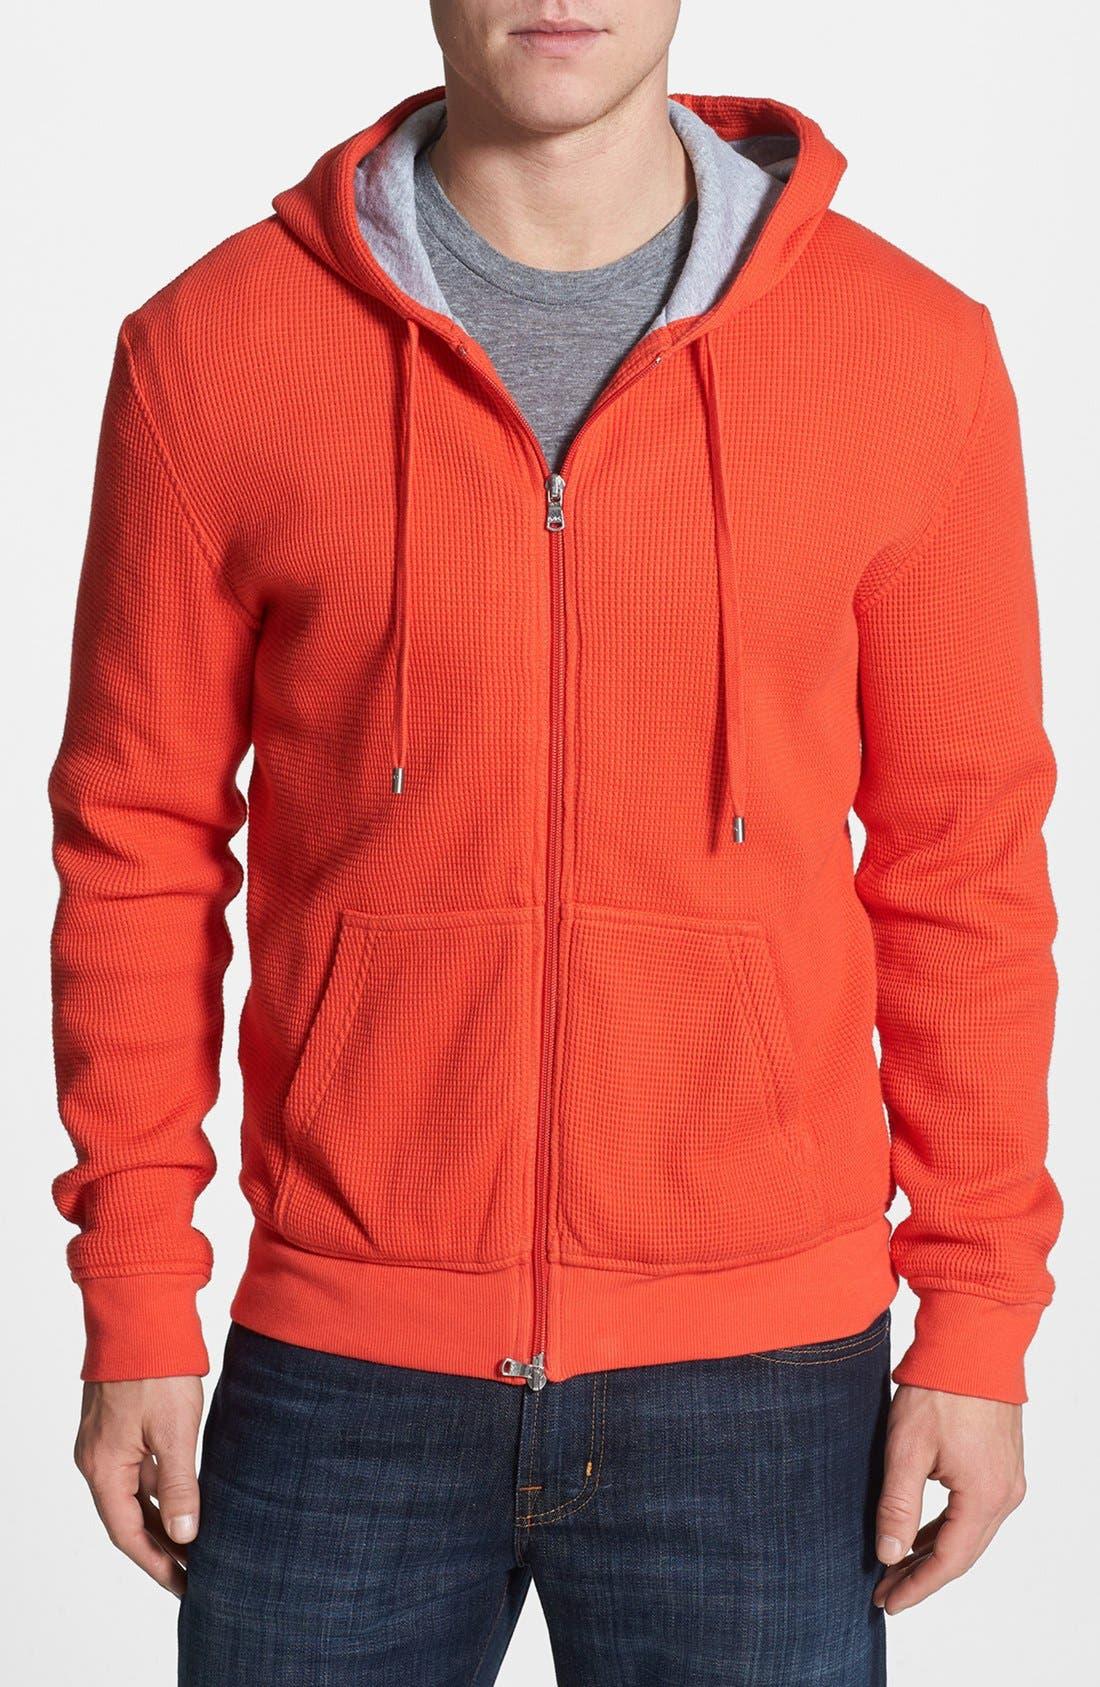 Main Image - Michael Kors Thermal Knit Zip Hoodie